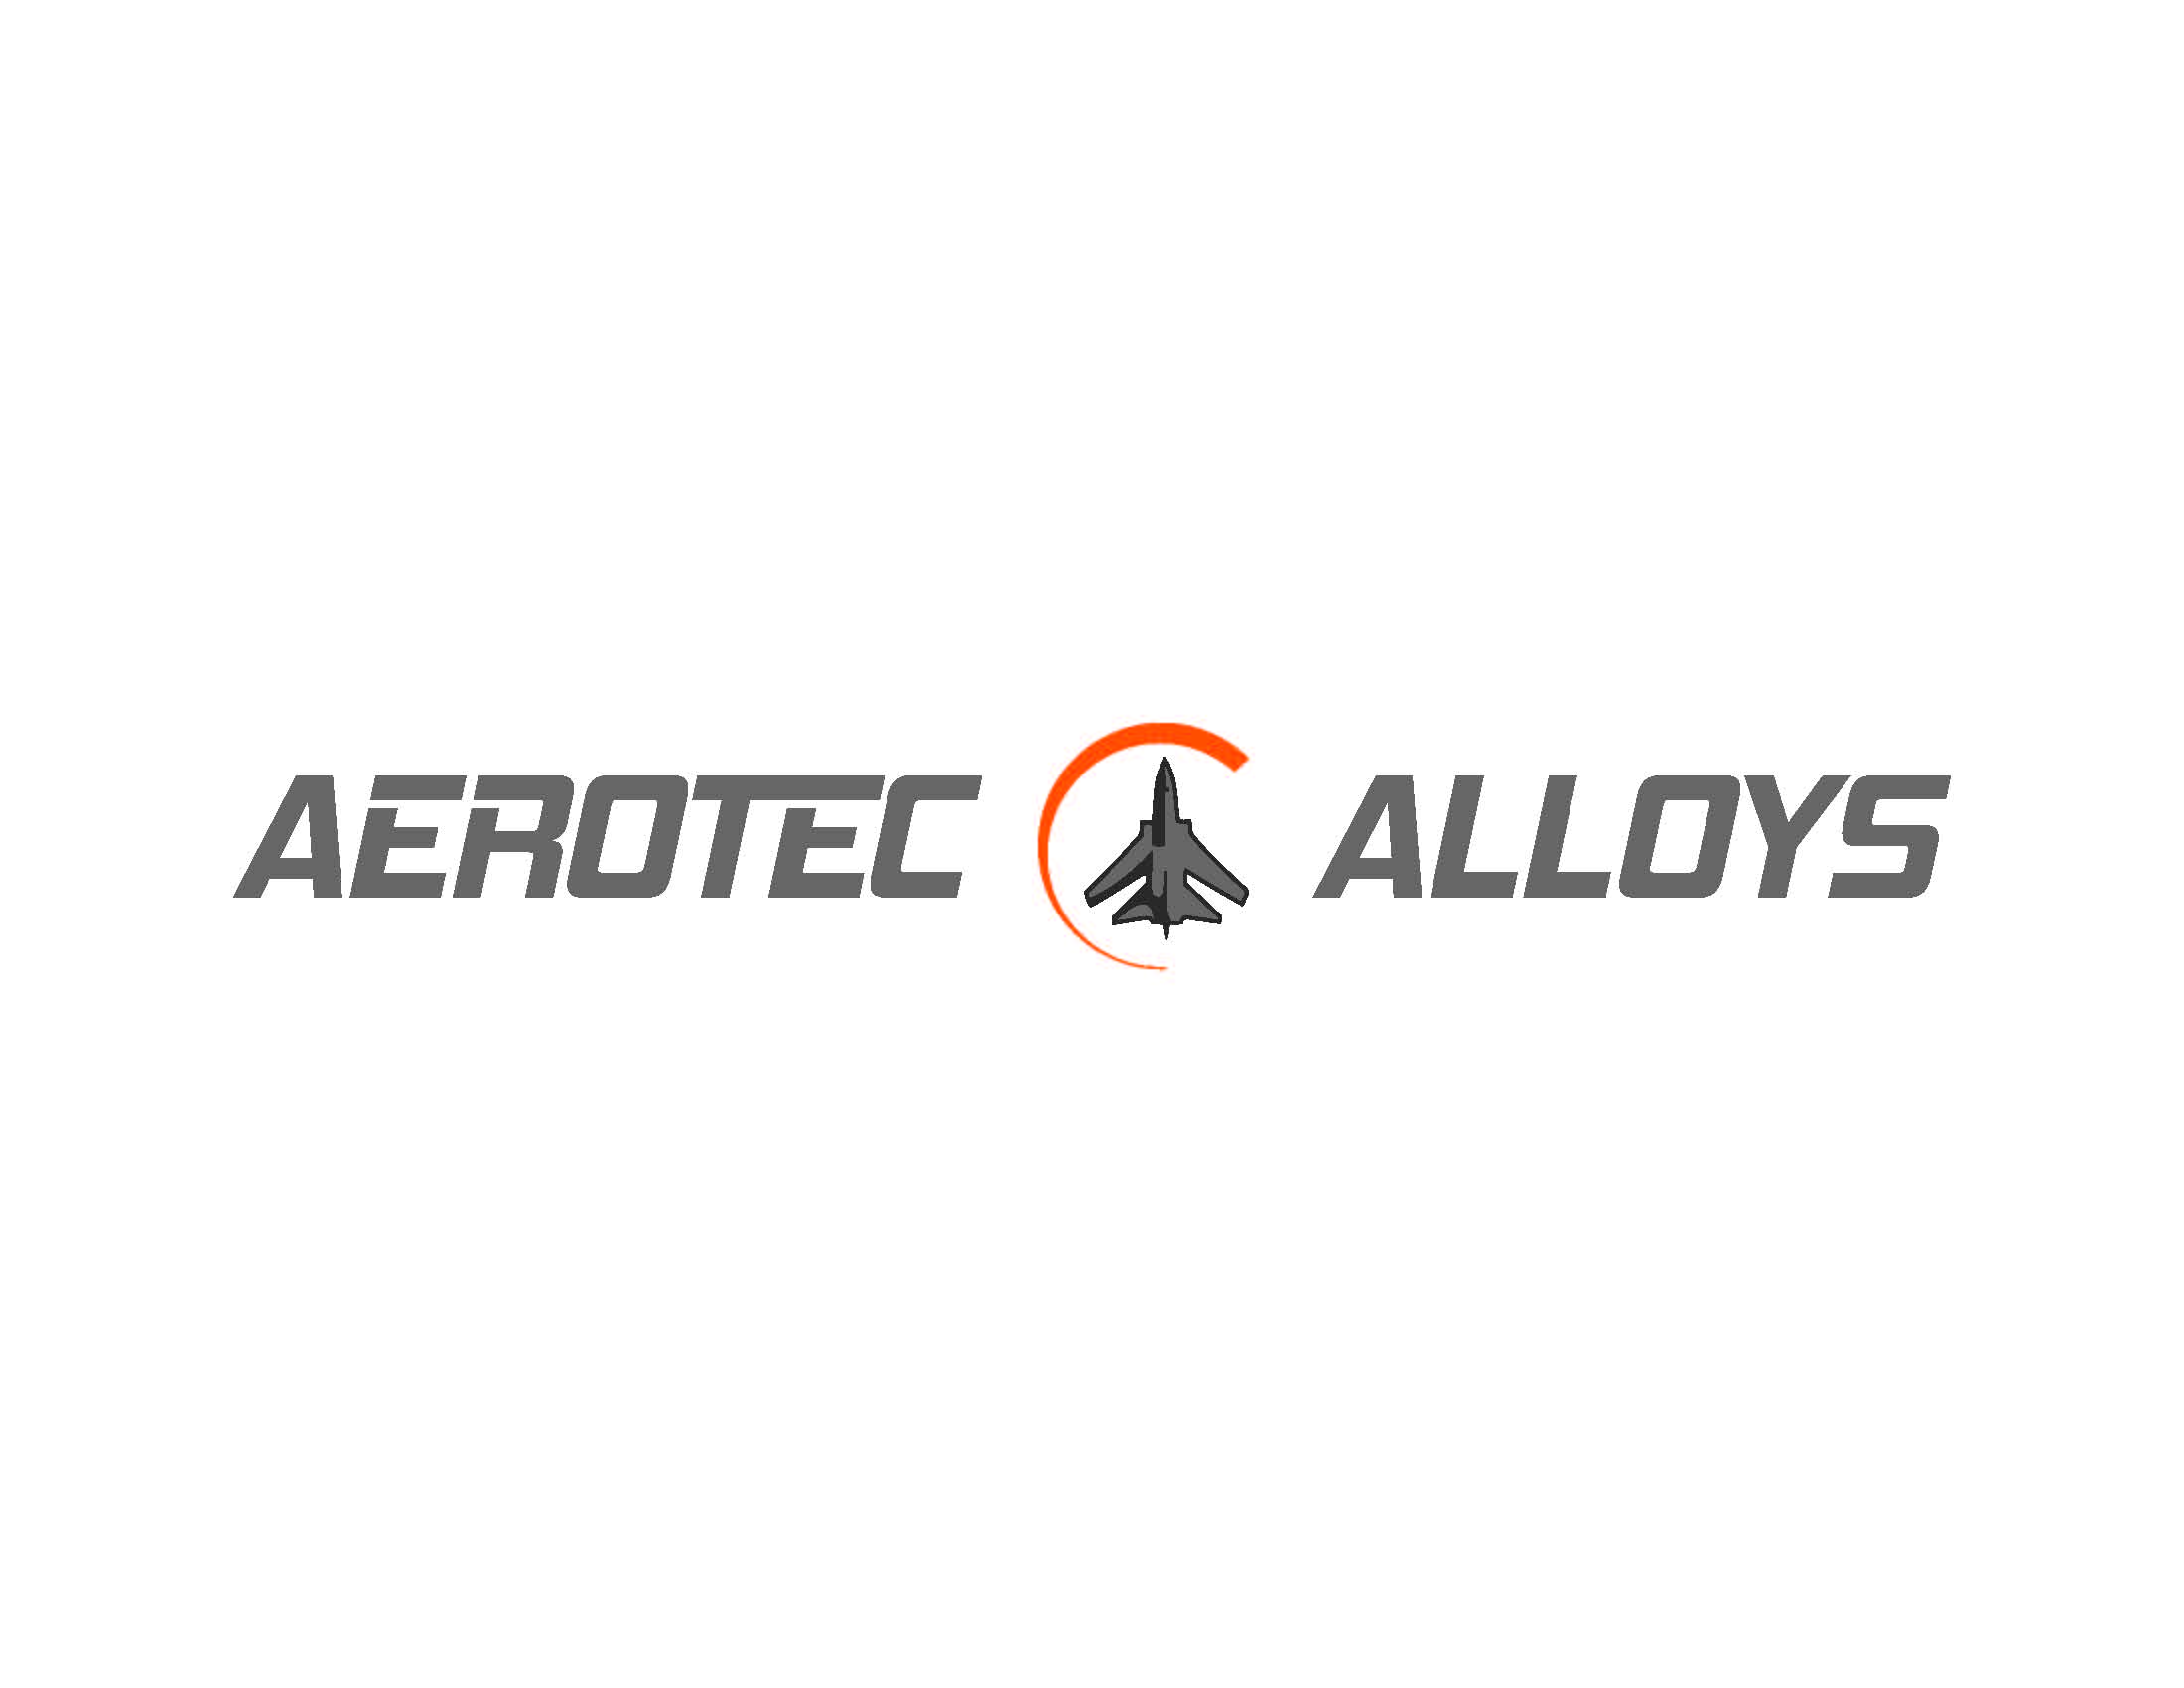 Aerotec Alloys